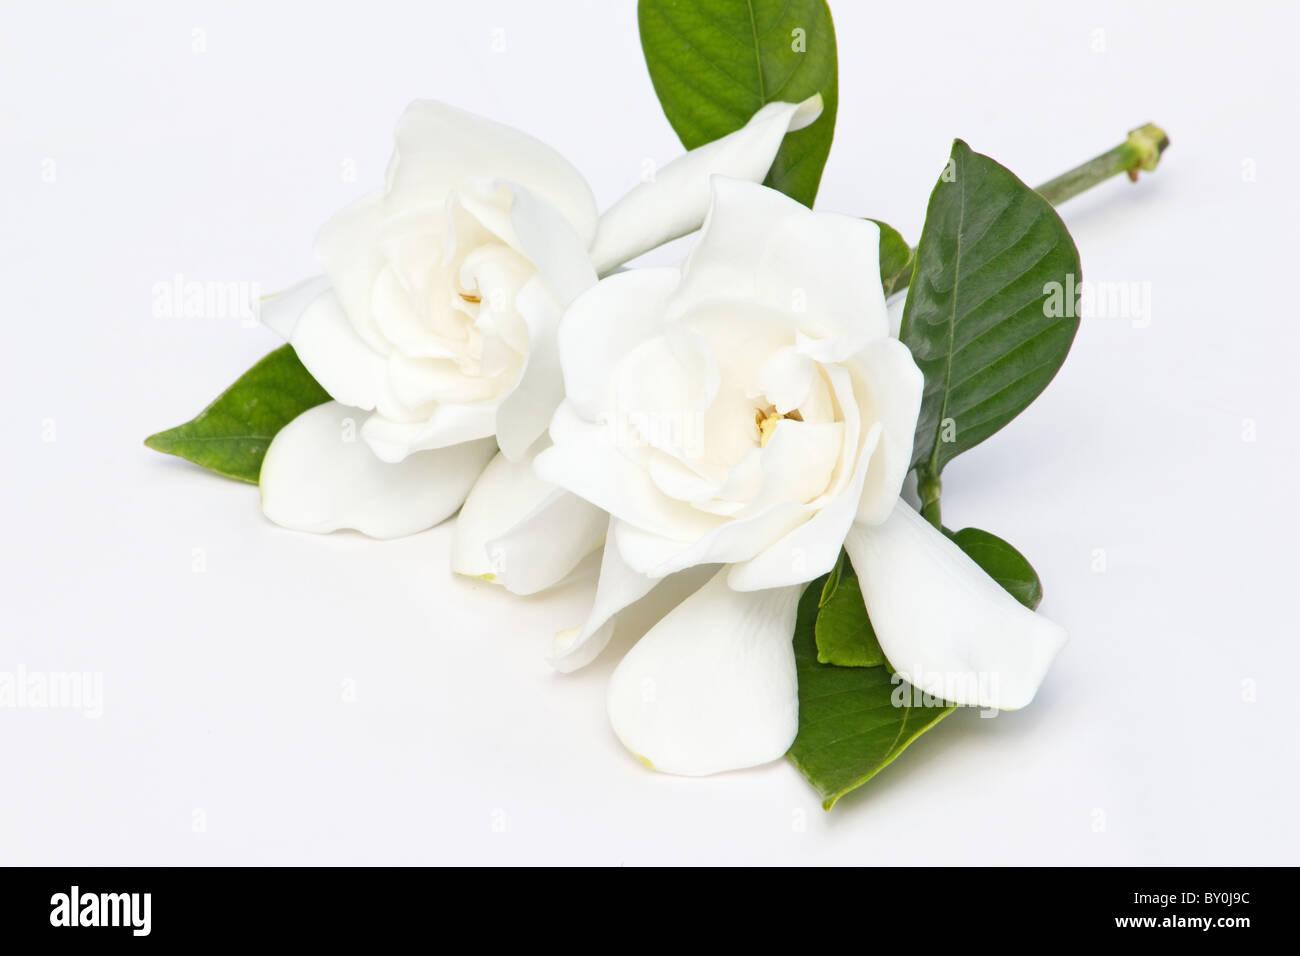 Close Up Of Gardenia Flowers (gardenia Jasminoides) On White Background